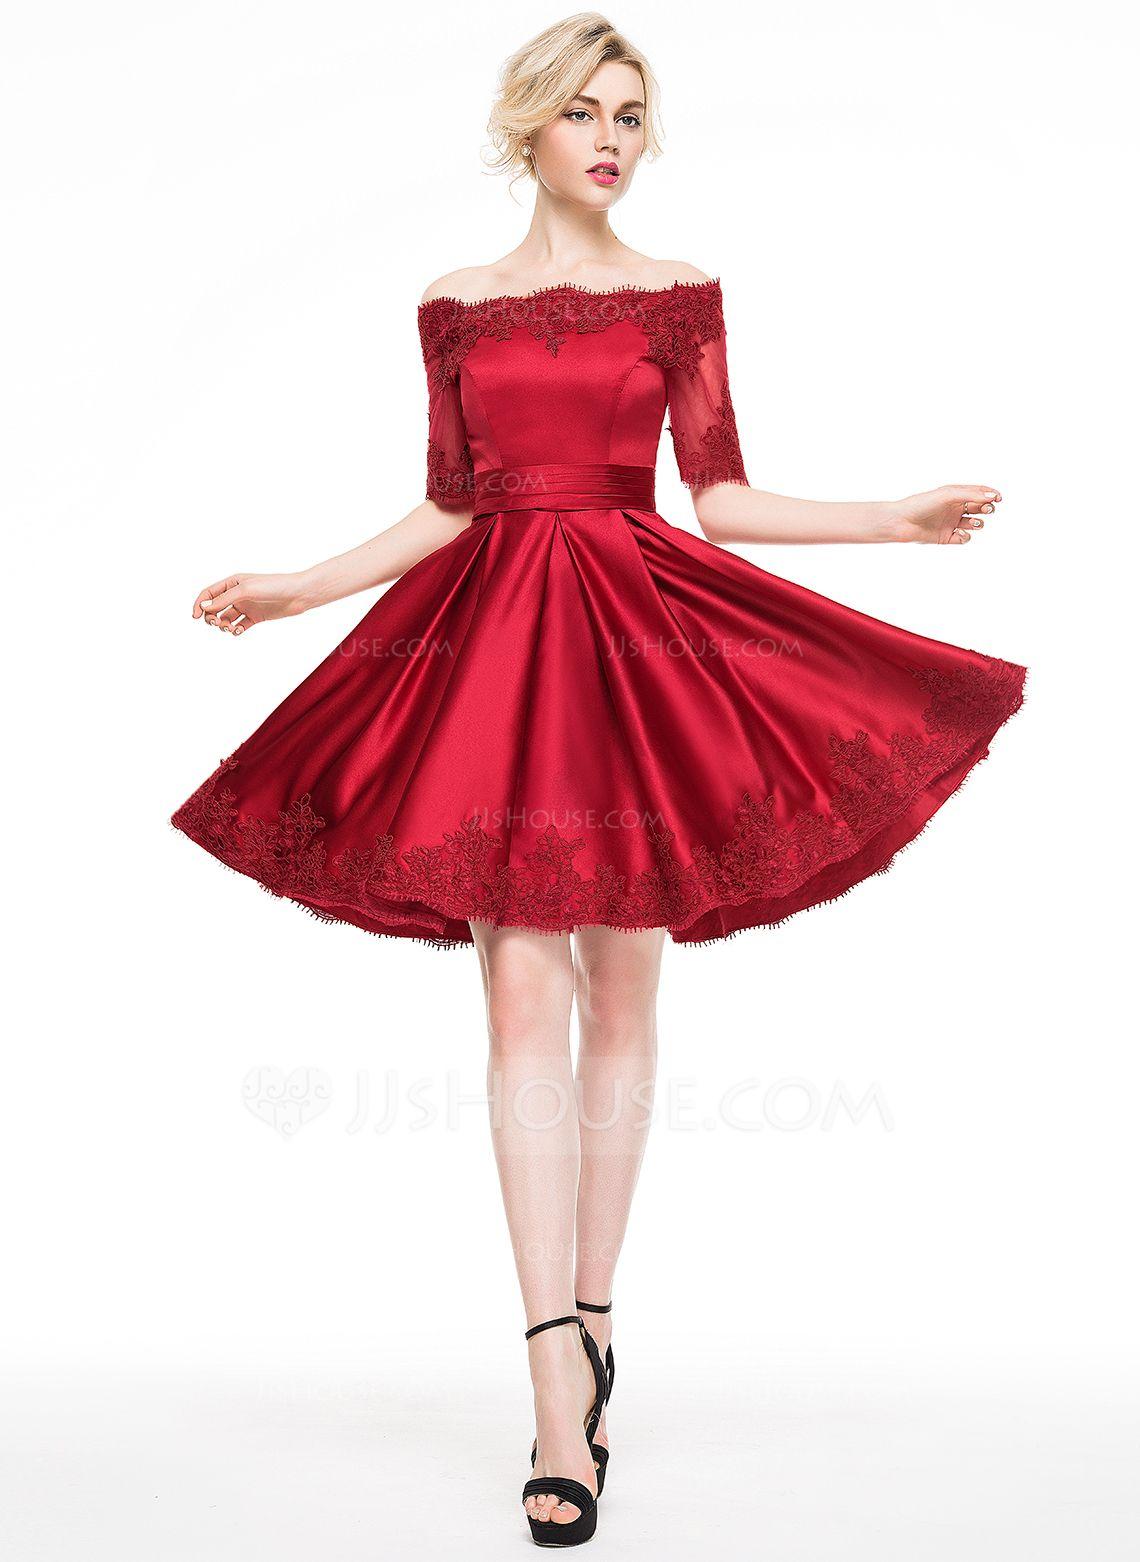 7c401863483 A-Line Princess Off-the-Shoulder Knee-Length Satin Prom Dresses With  Appliques Lace (018113172) - Prom Dresses - JJ s House